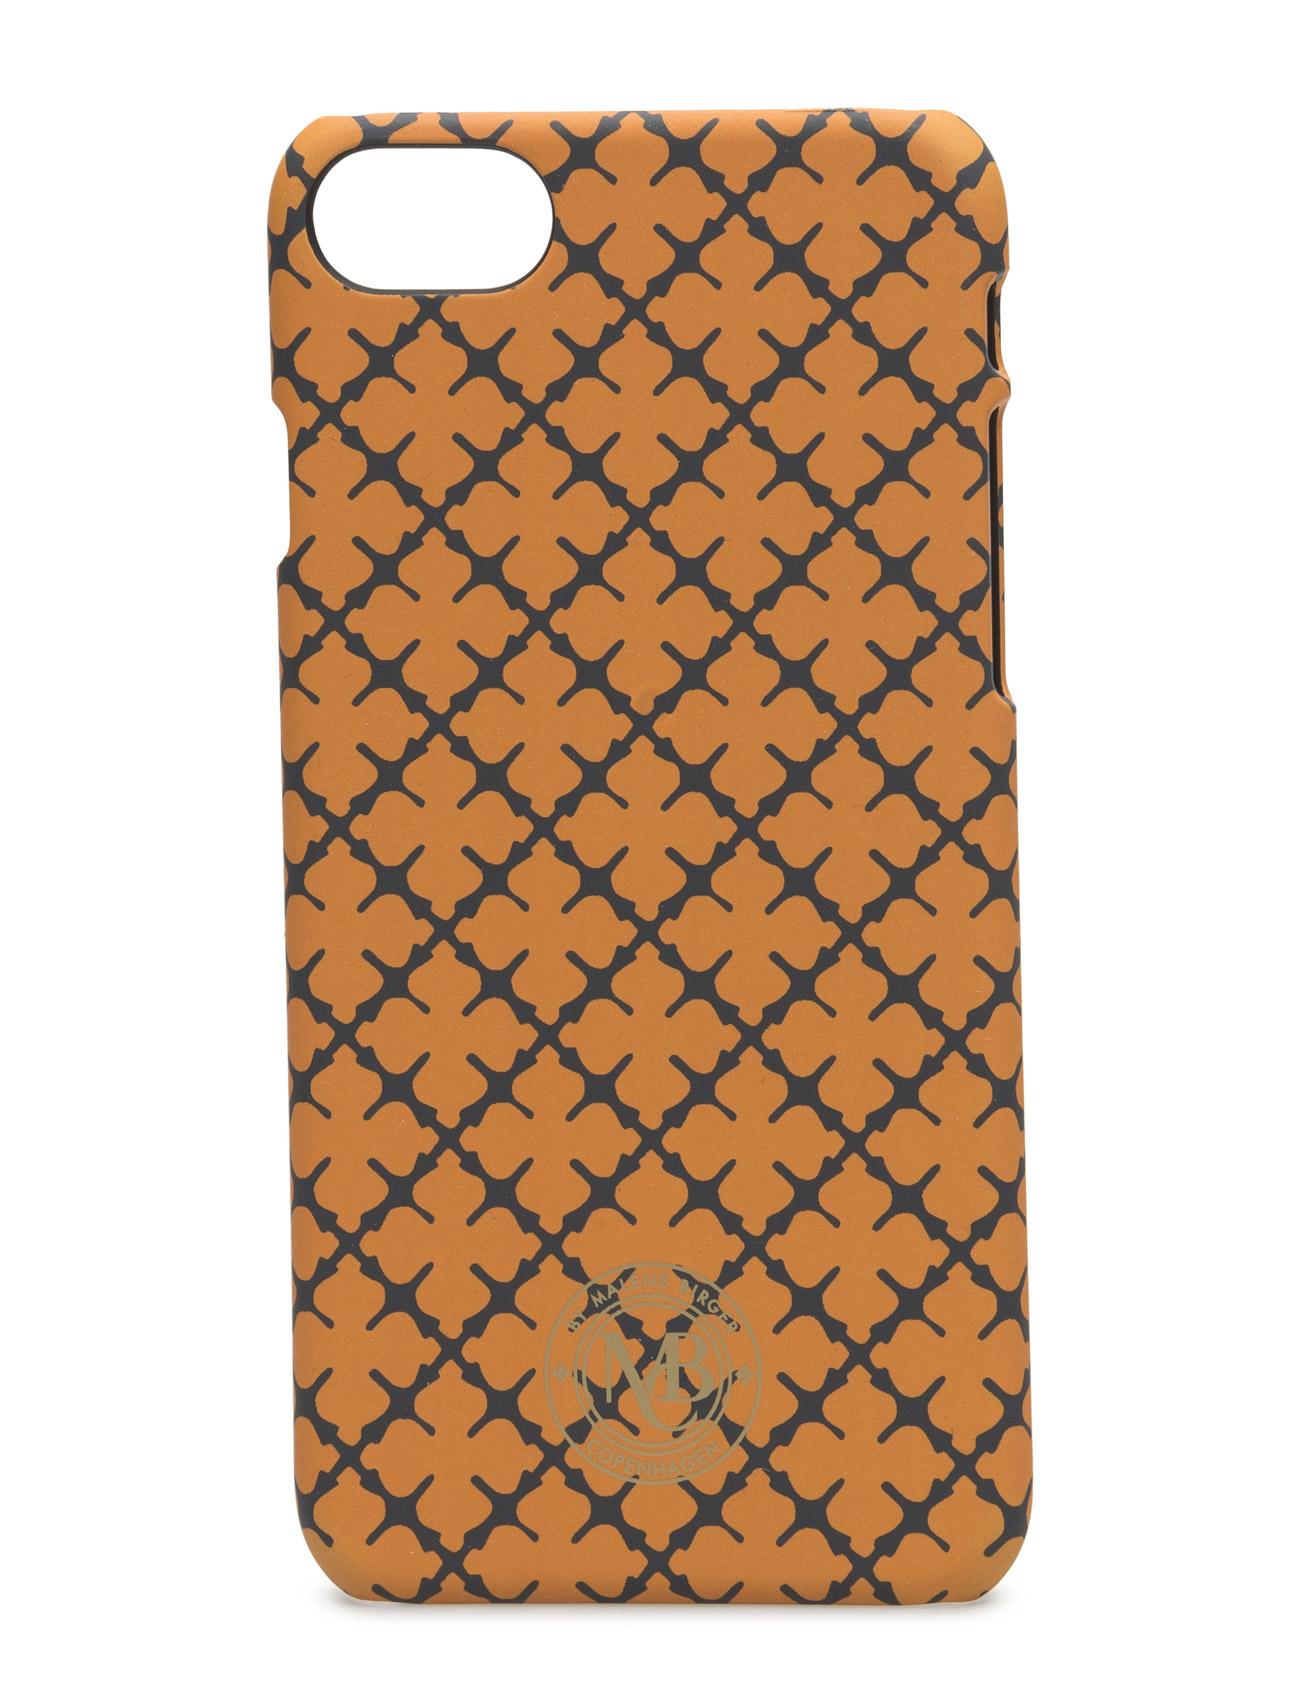 Pamsy7 By Malene Birger Mobiltelefon accessories til Damer i ... 940f684d1b9c7